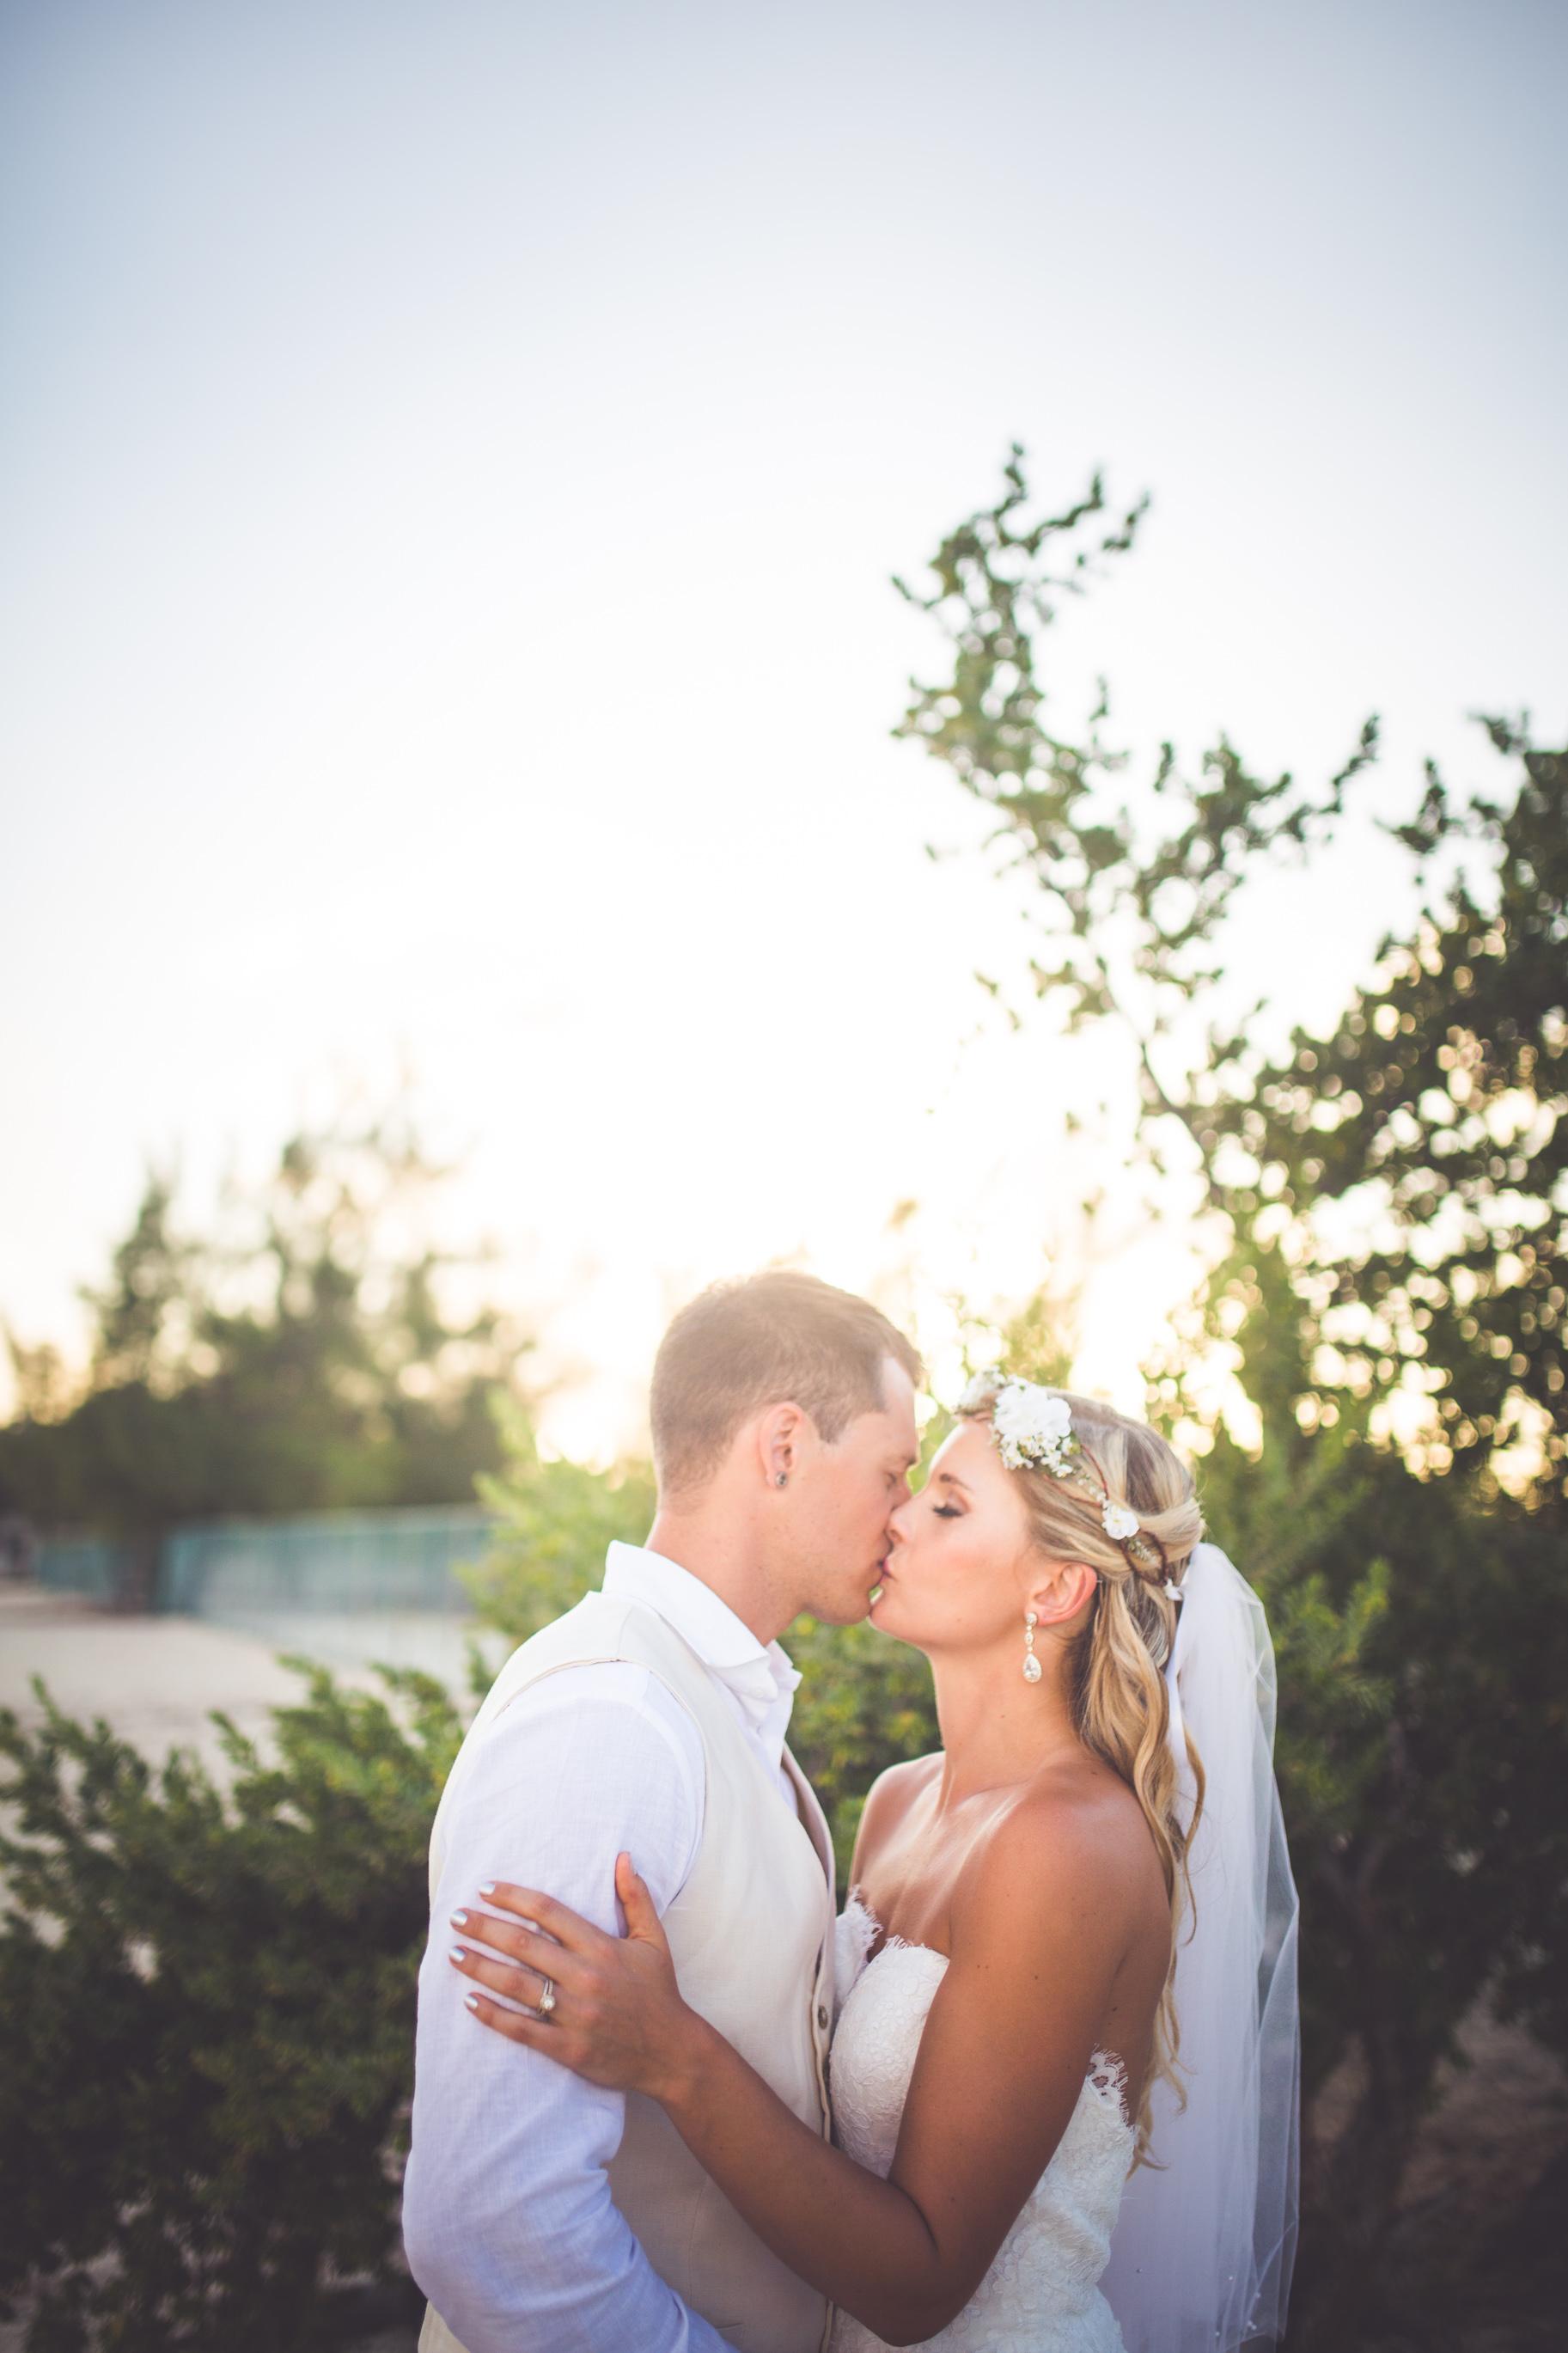 CARMEN-PETER-WEDDING-2016-142.jpg